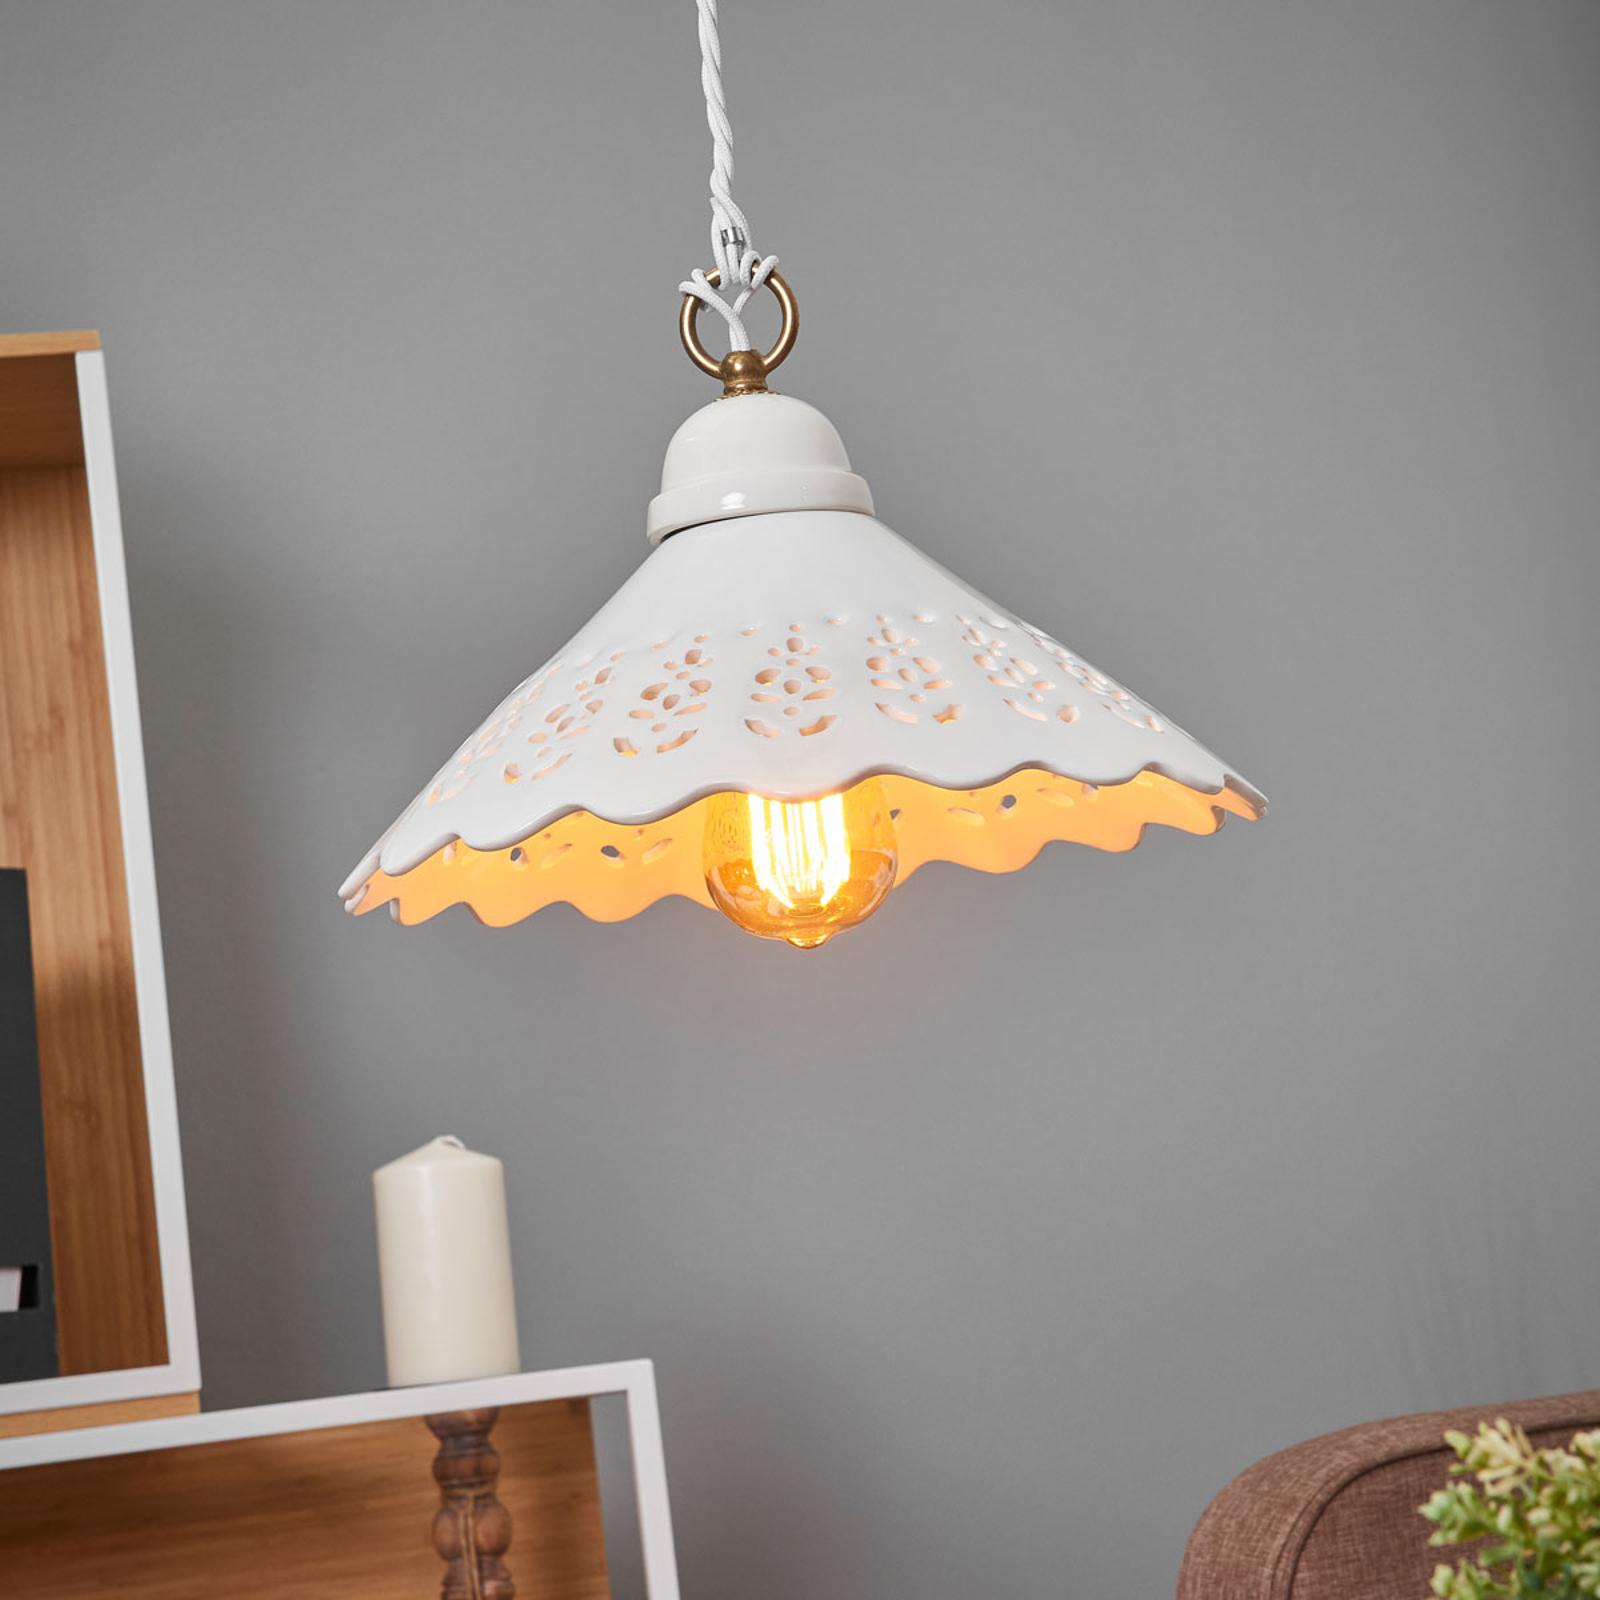 Pizzo hængelampe, 1 lyskilde, 30 cm